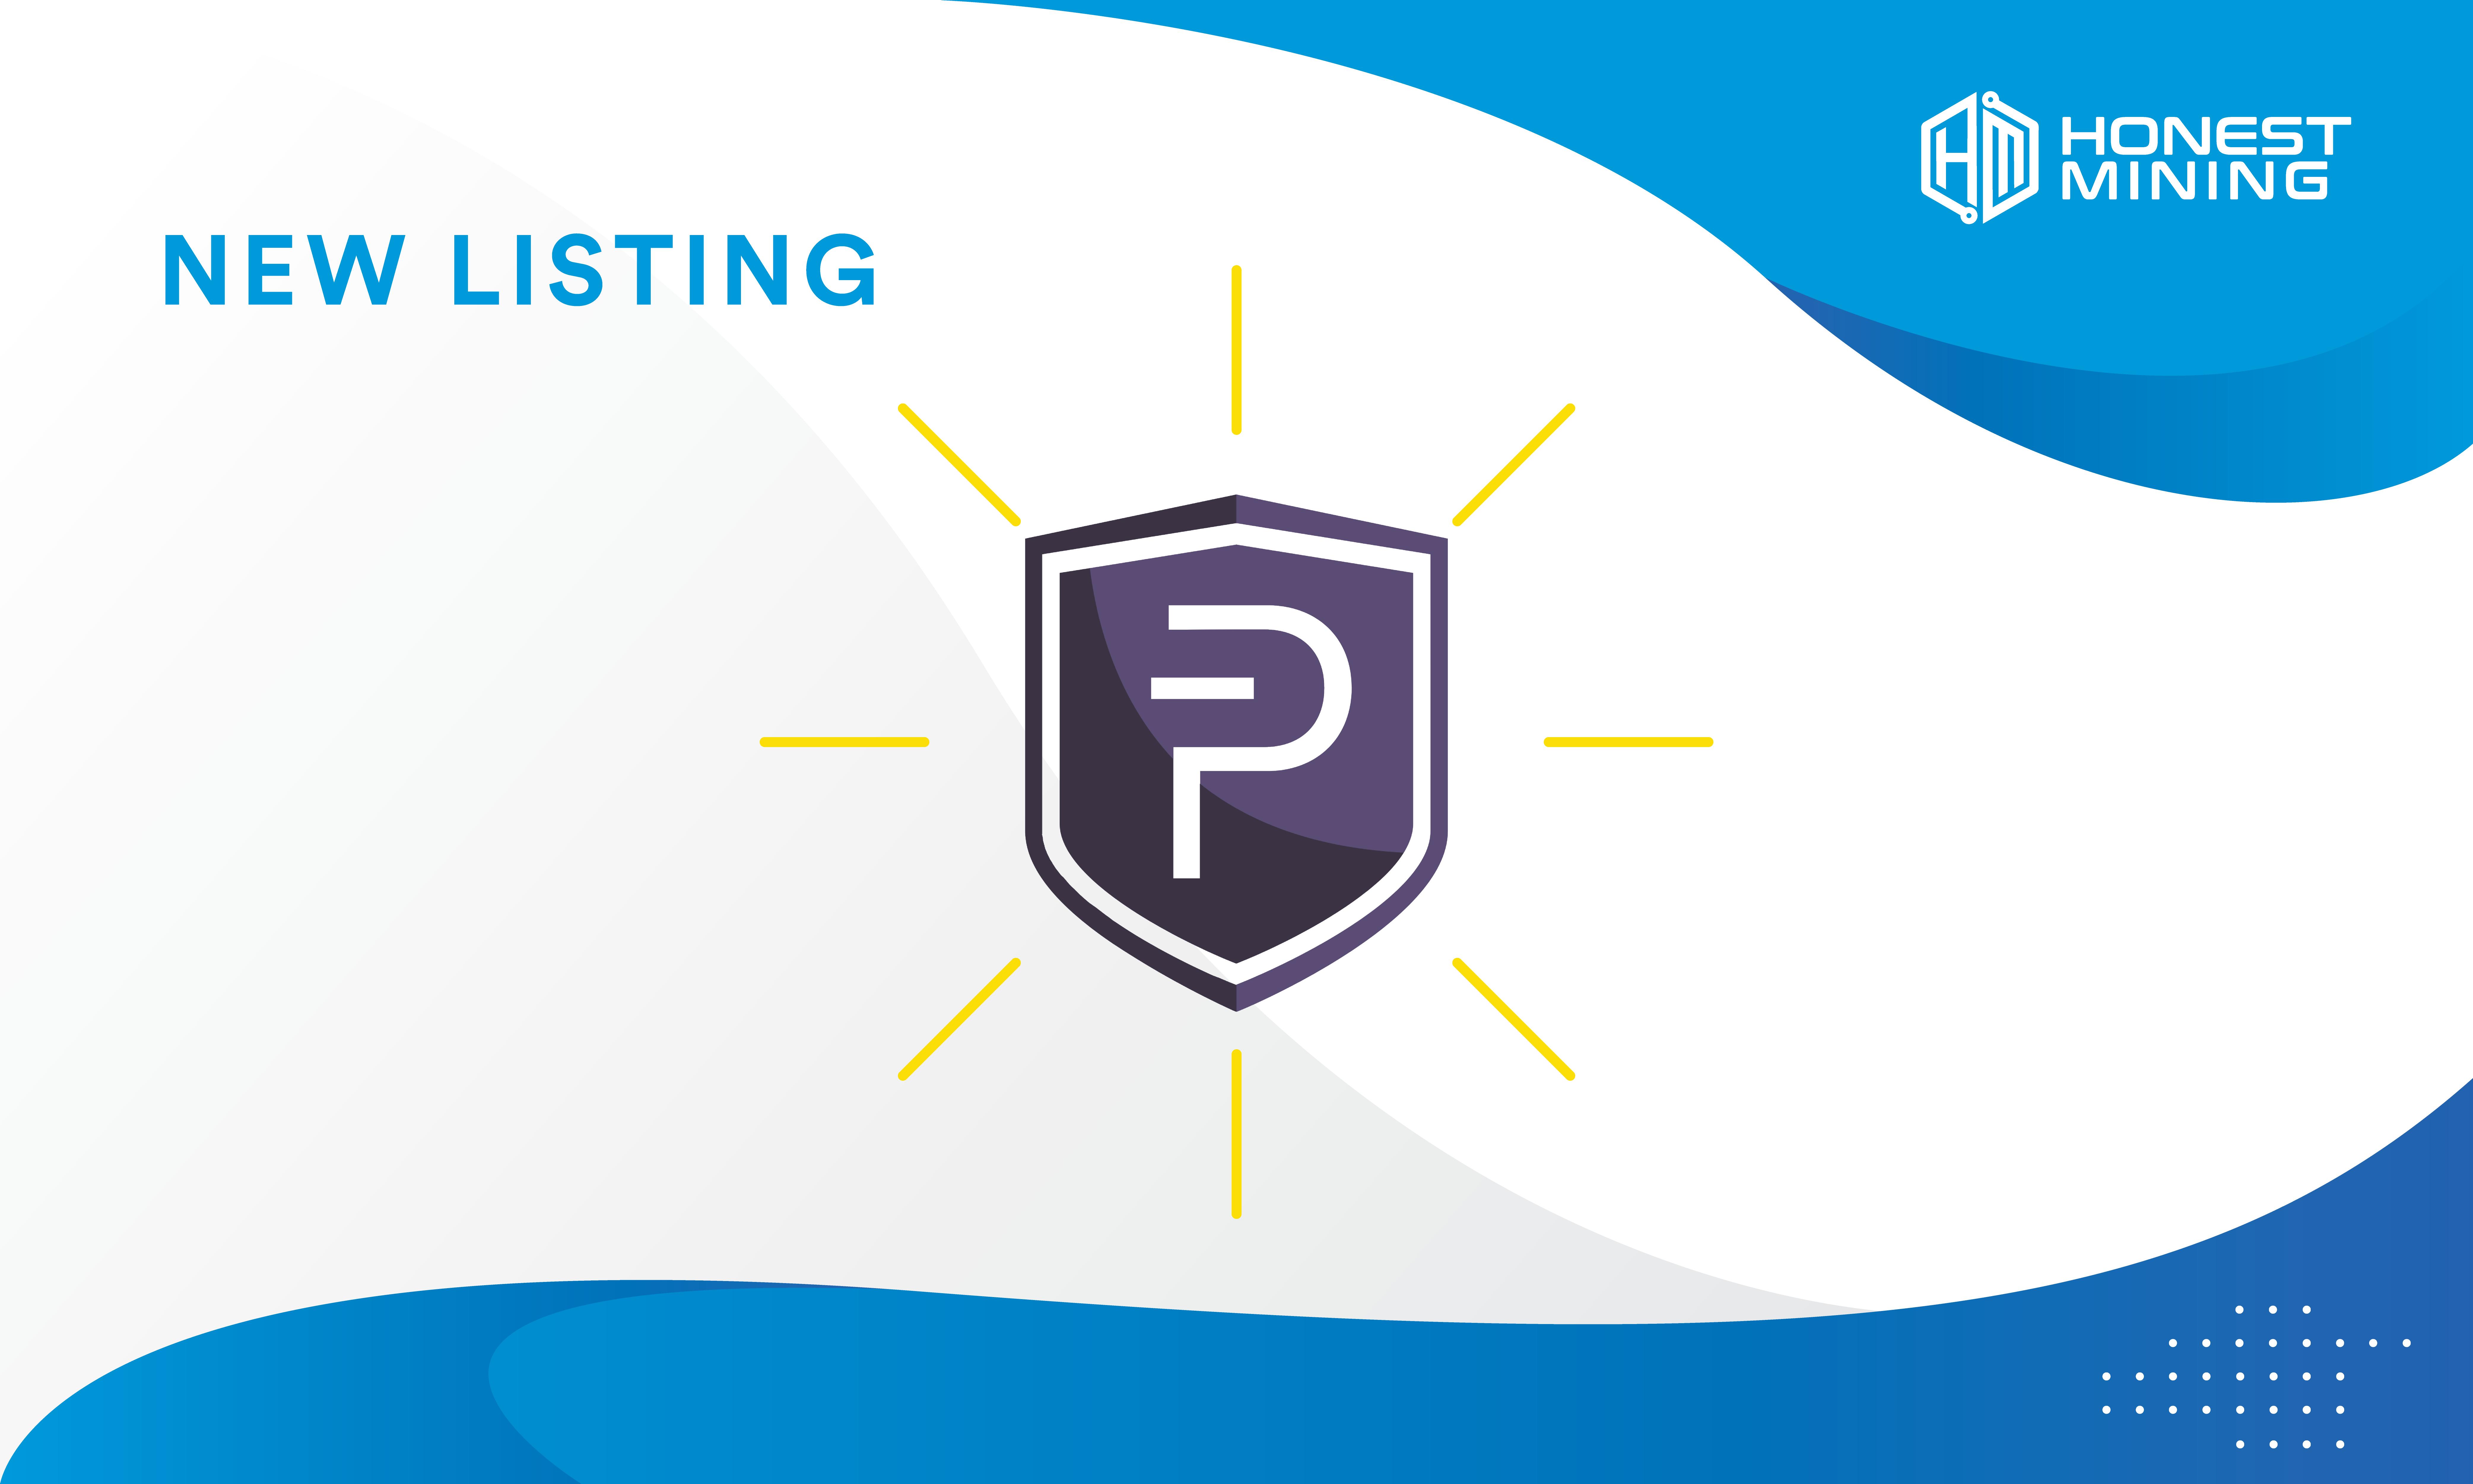 PIVX is now listed on Honest Mining Platform